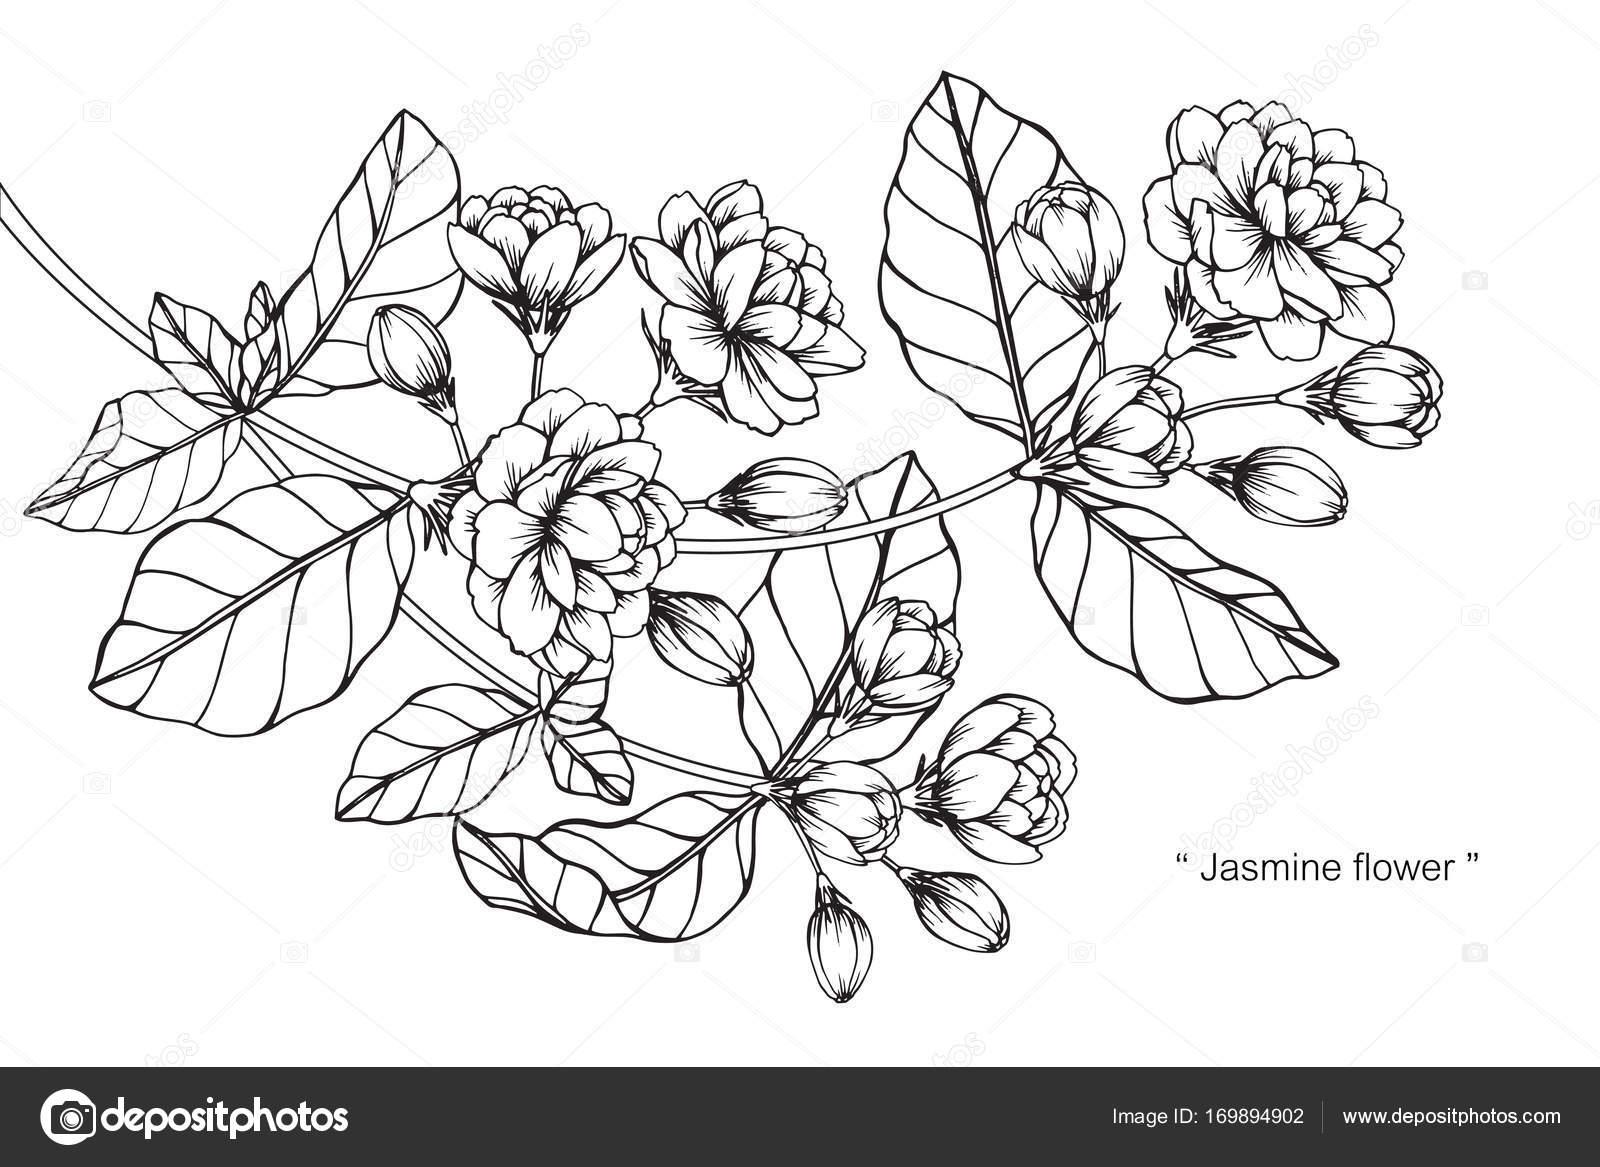 Flor Del Jazmín Dibujo Dibujo Con Línea Blanco Negro Arte — Archivo ...